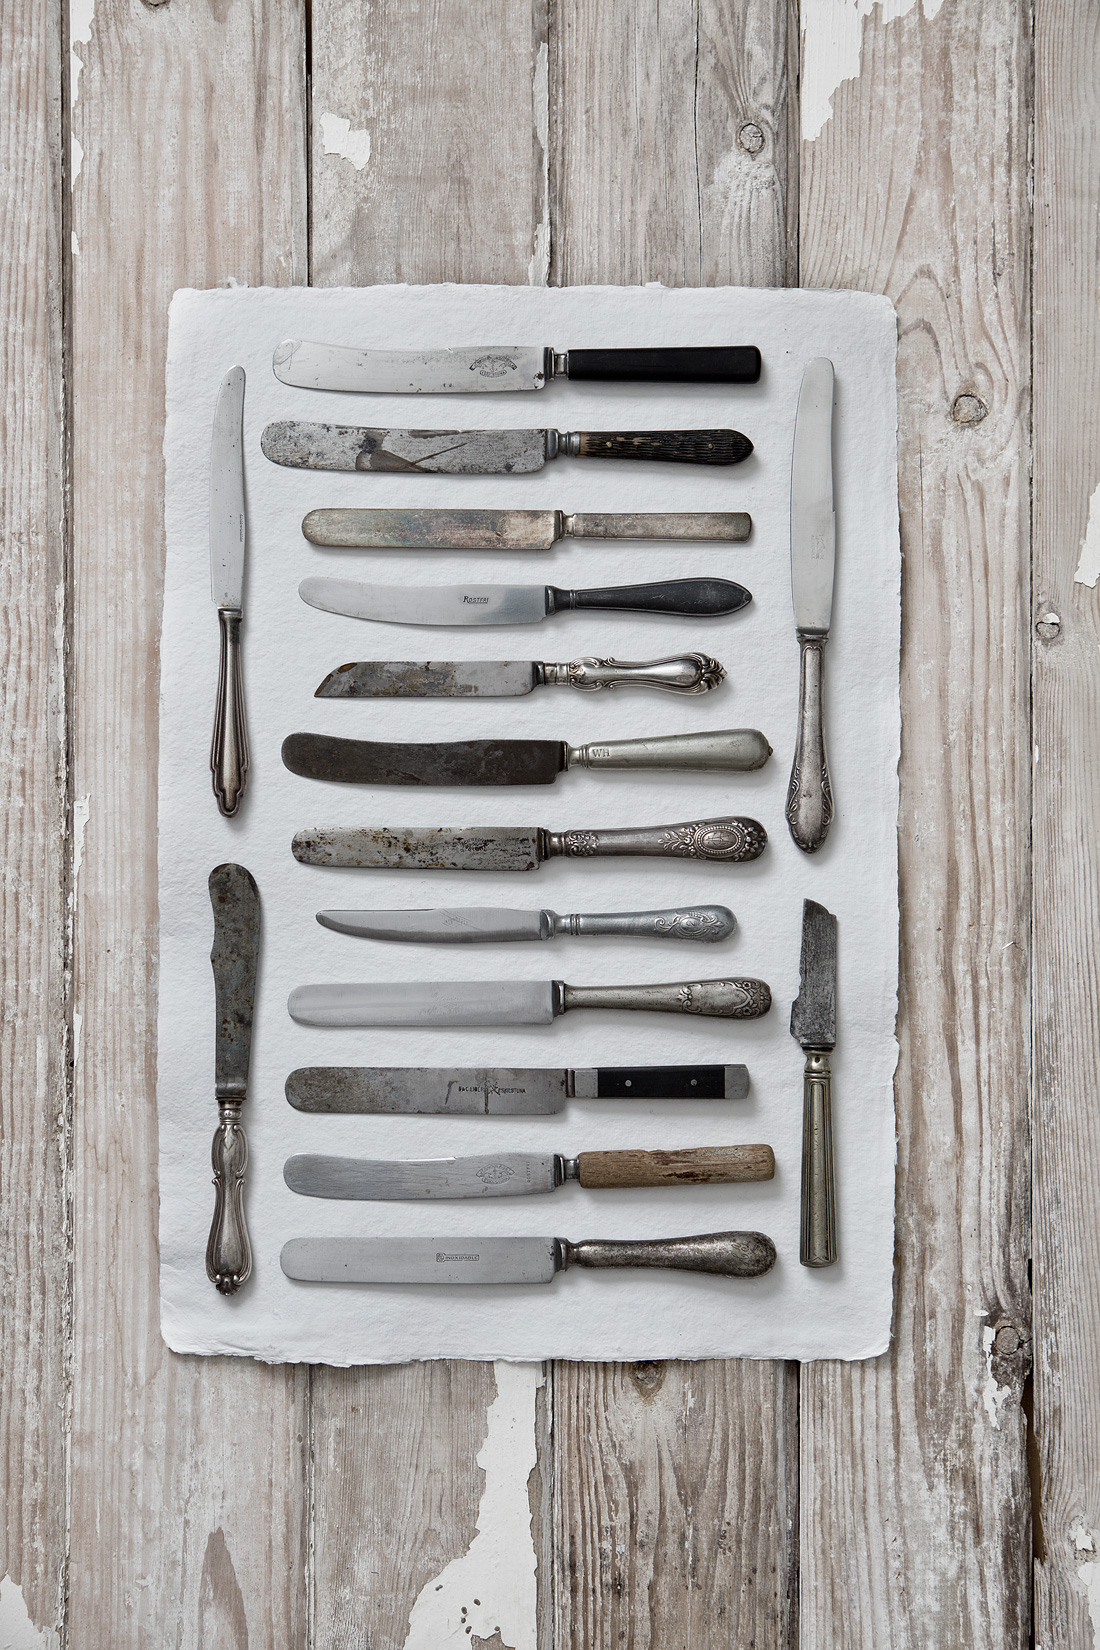 Knife©Anna-Lefvert